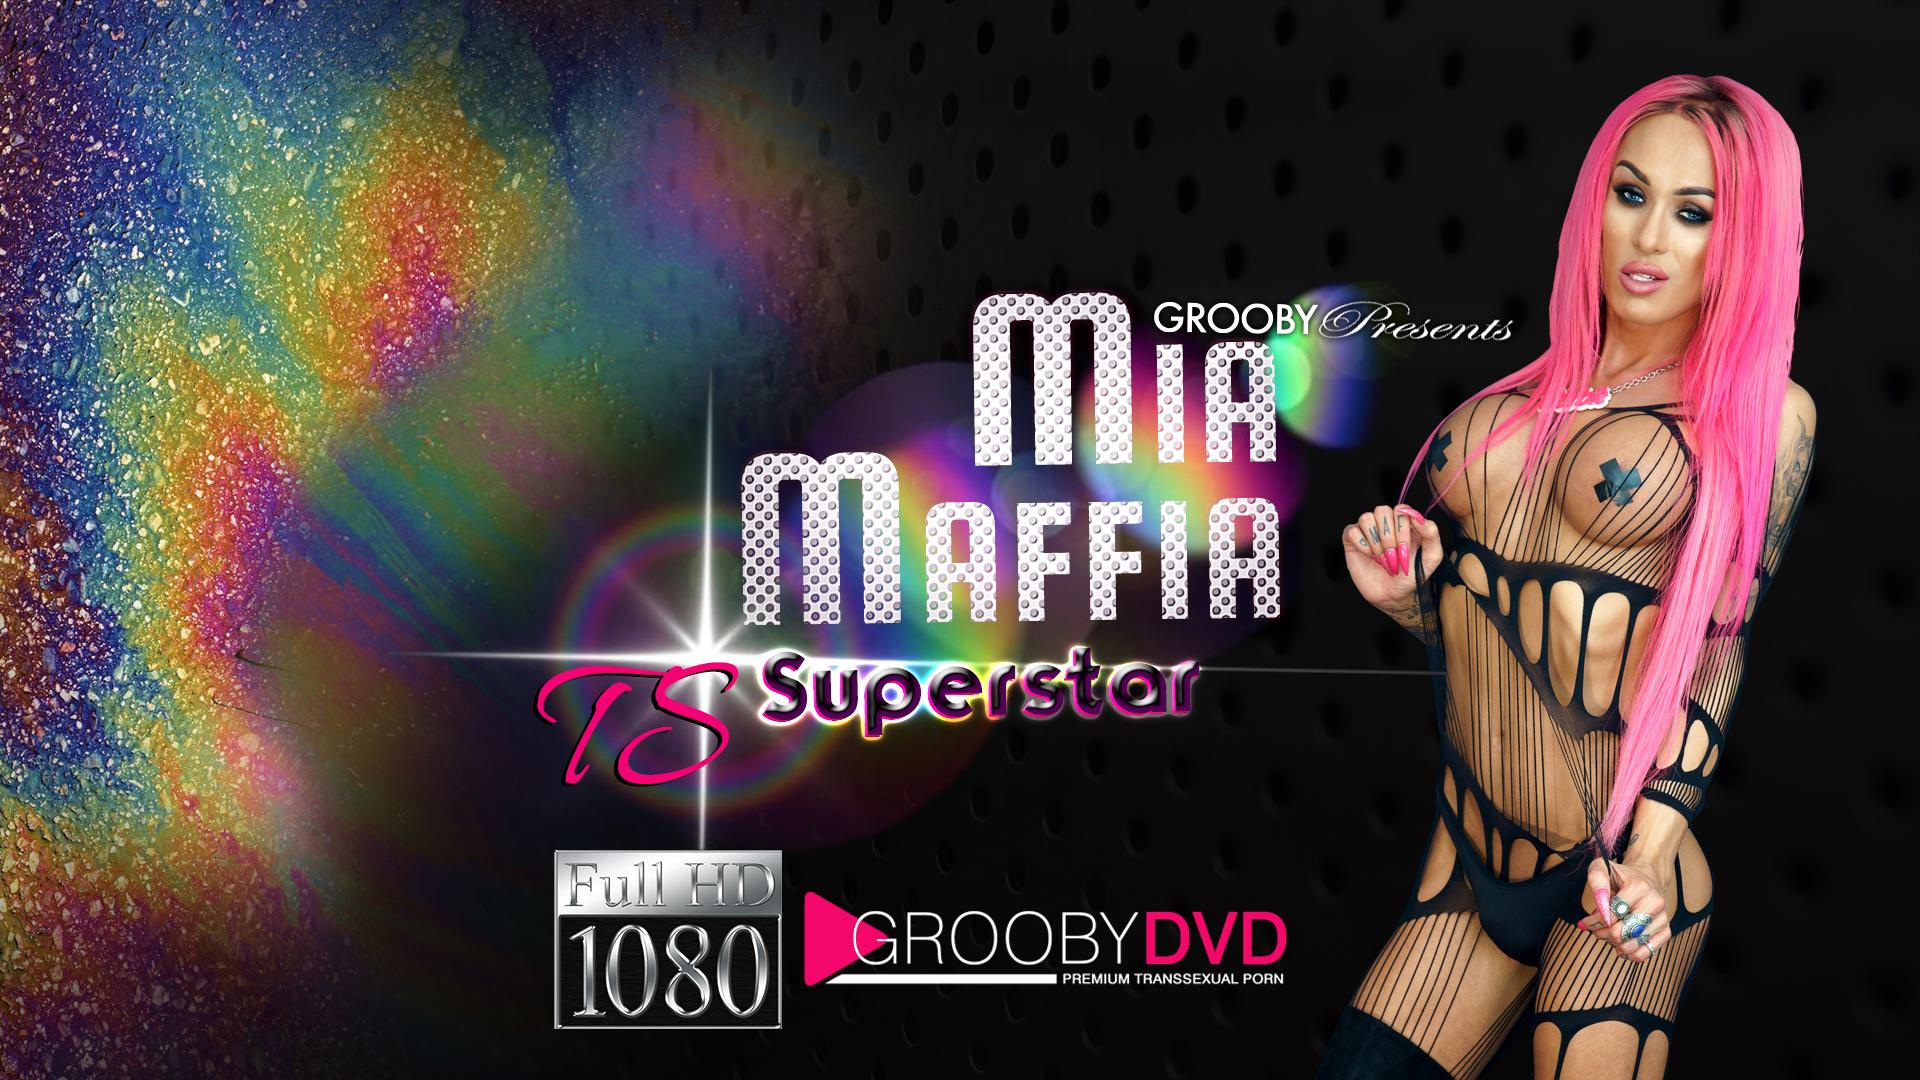 Titlecard-MIA-MMSS-4GroobyDVD